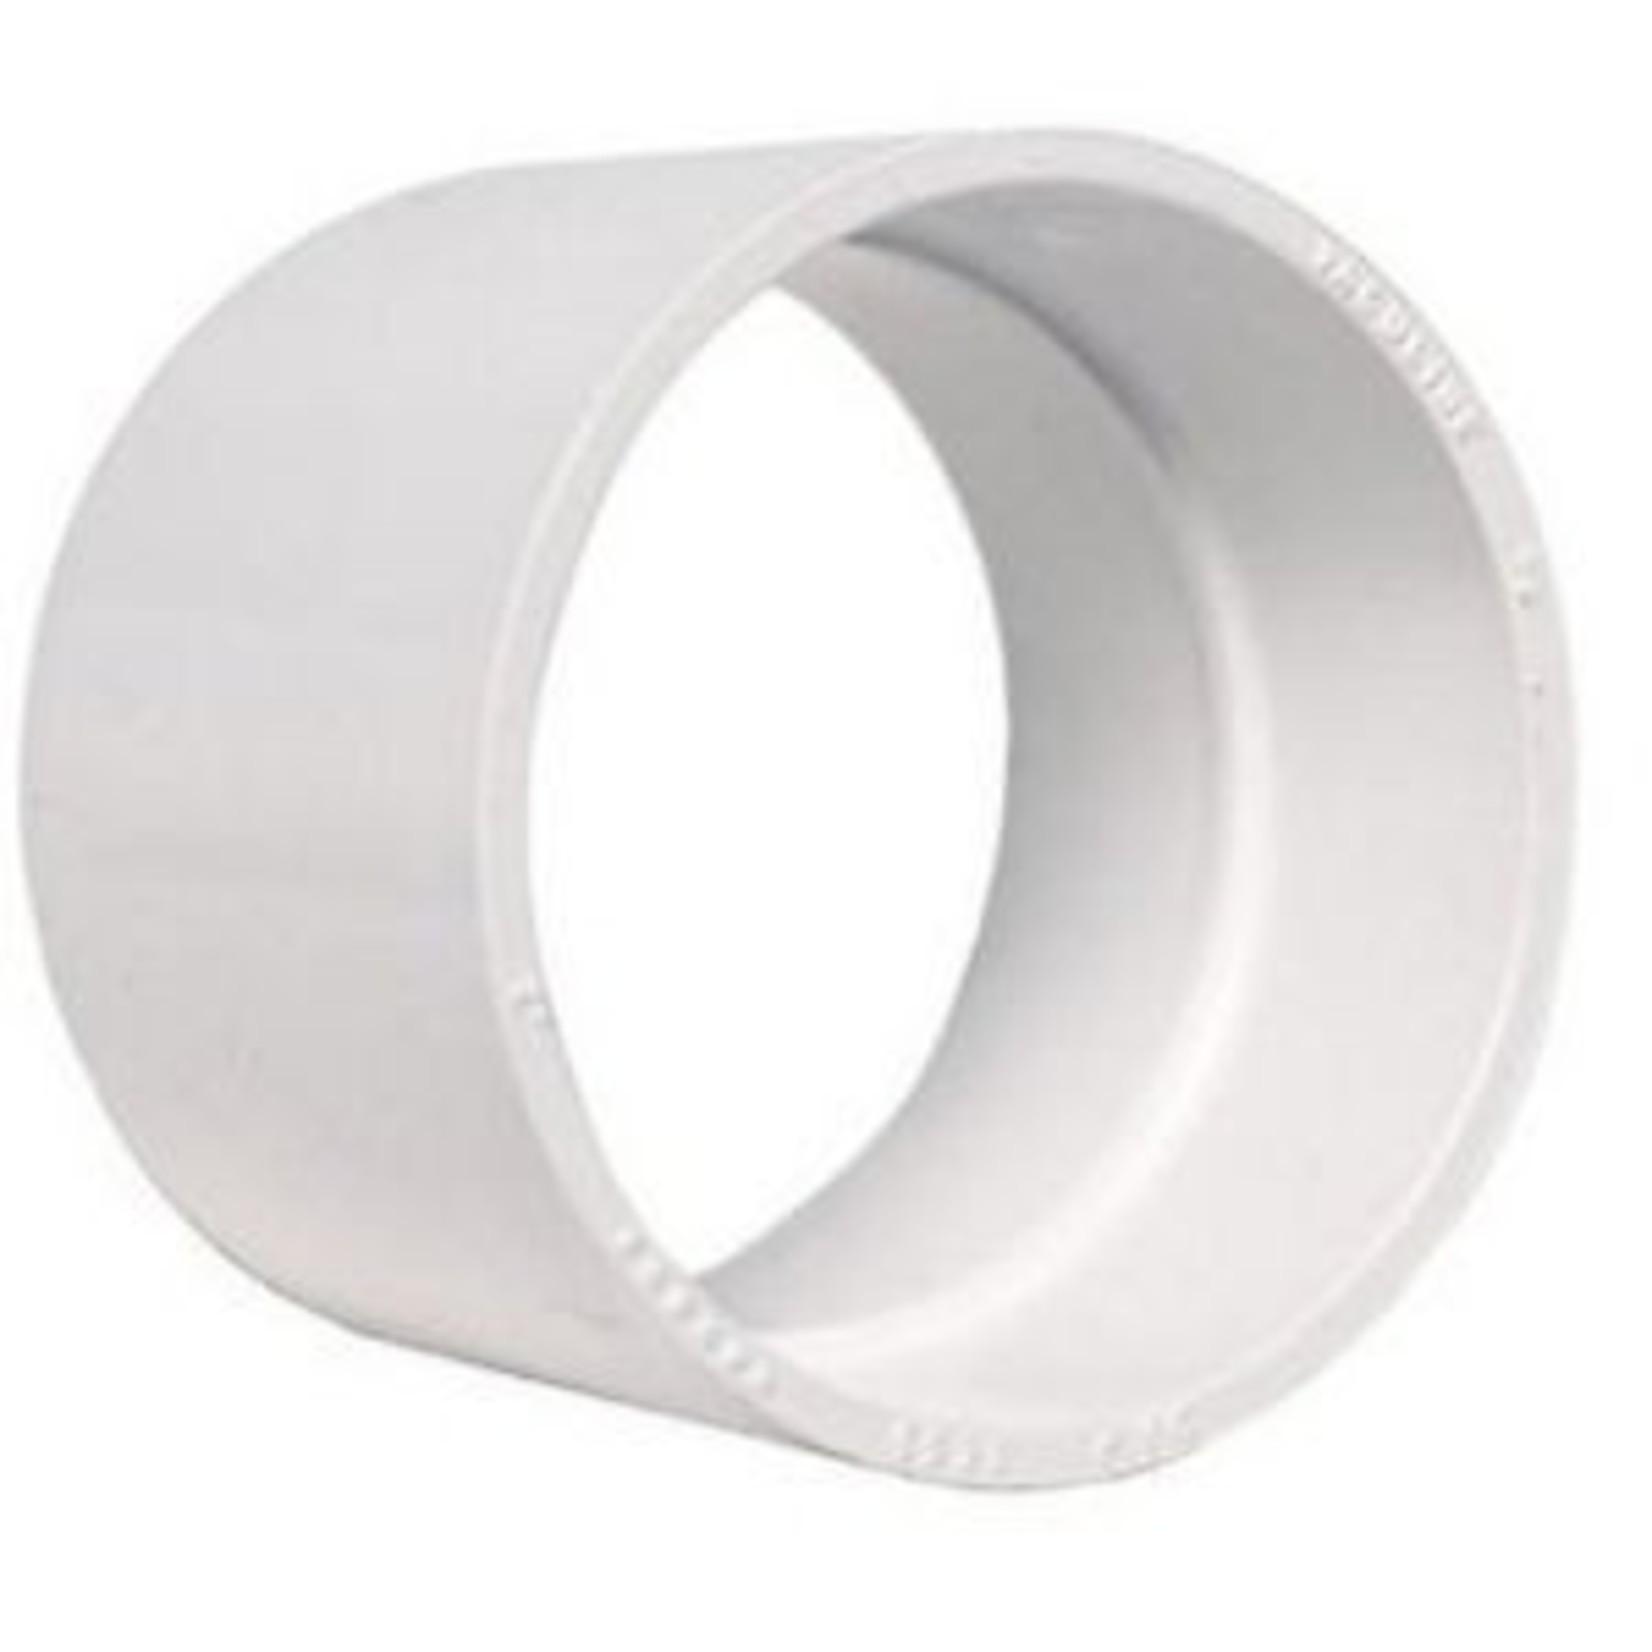 Plastiflex CVS Stop Coupling Fitting - Single